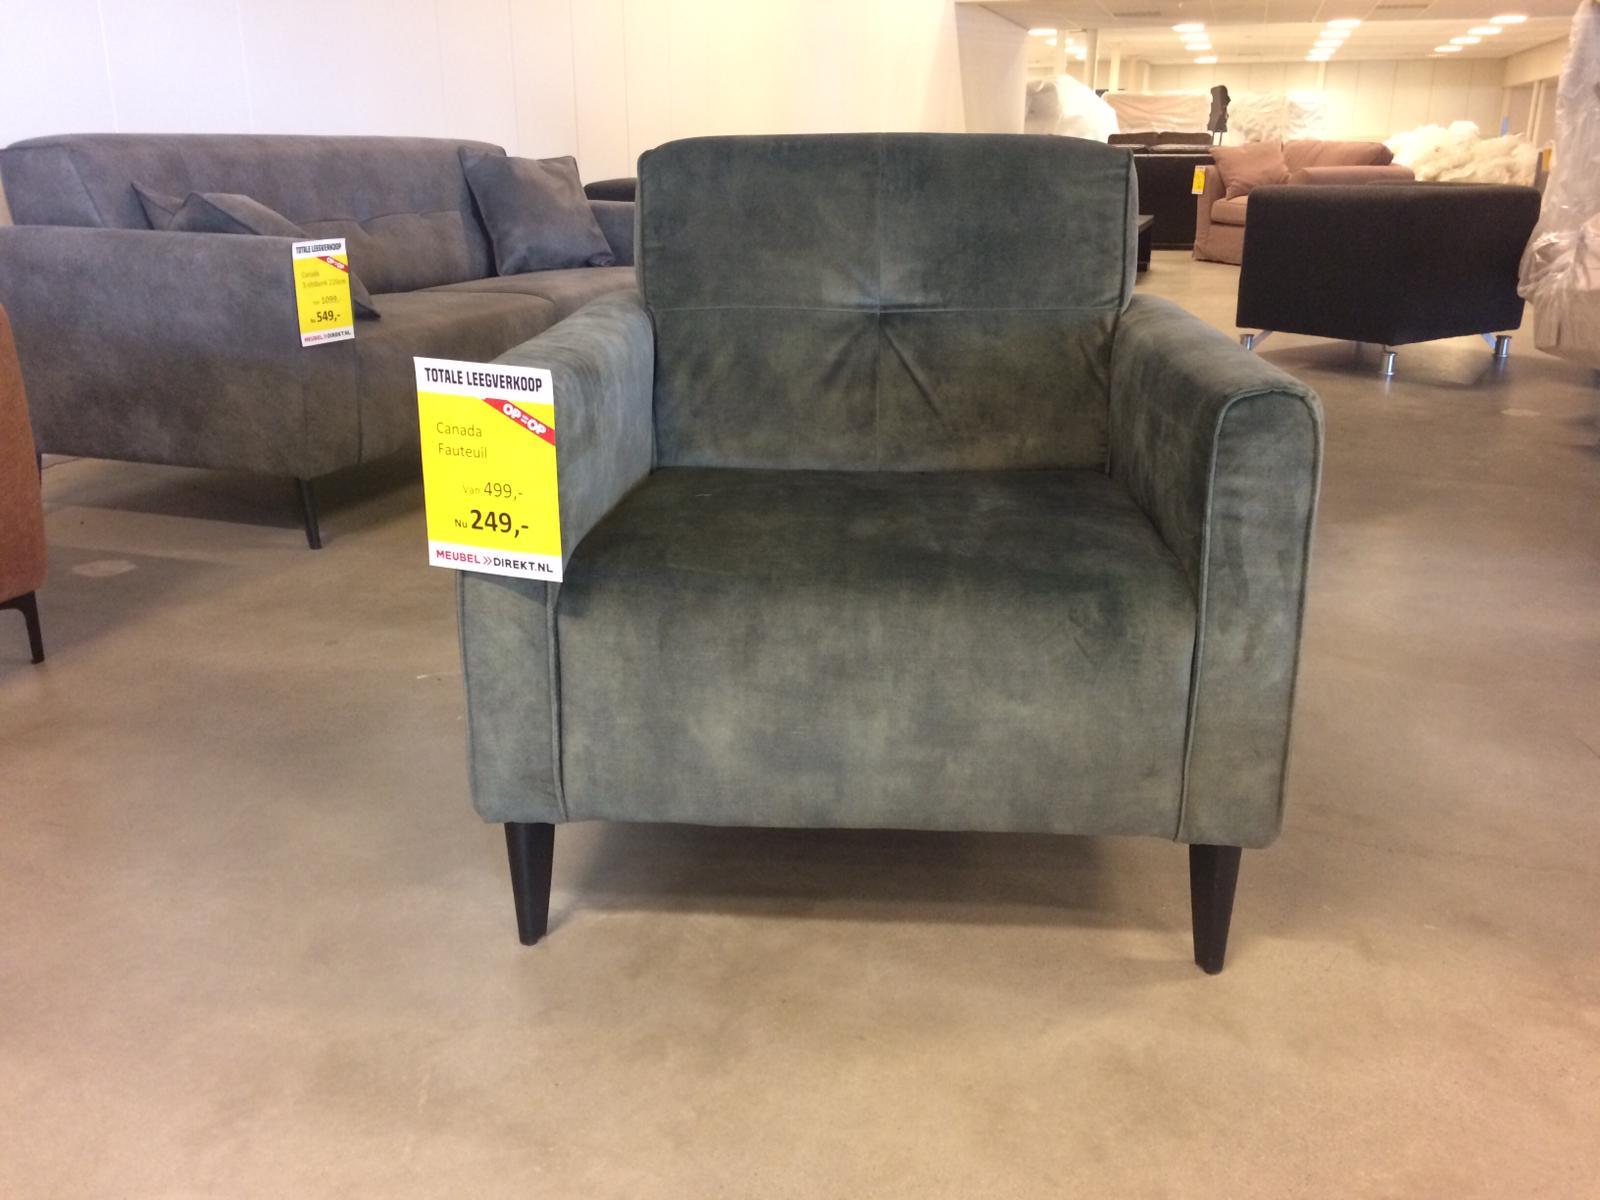 Canada fauteuil